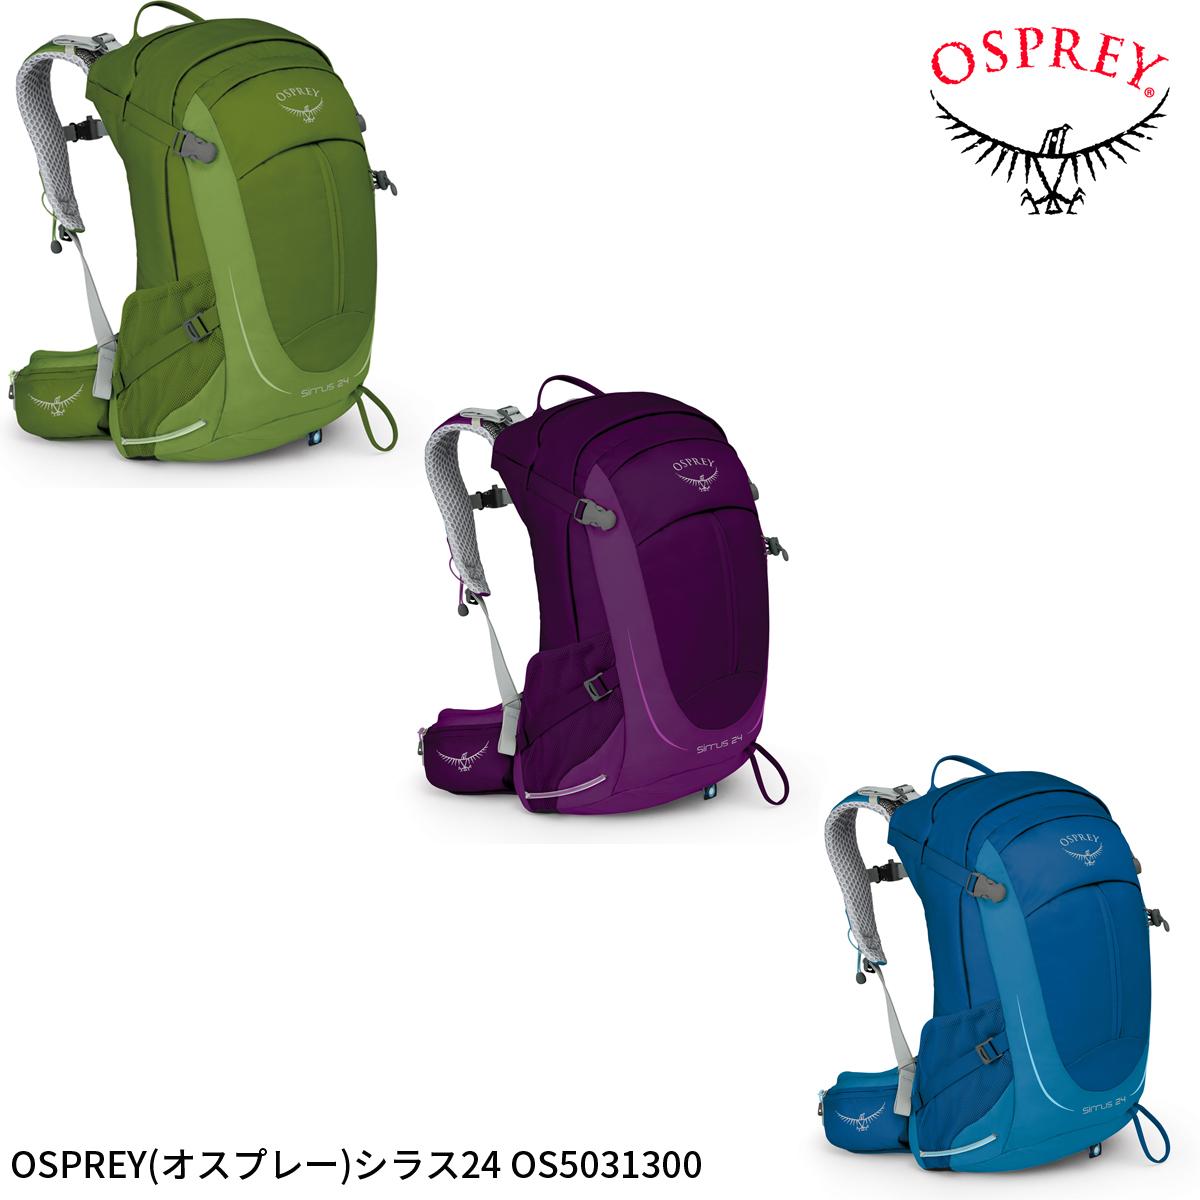 OSPREY(オスプレー)シラス24 OS5031300